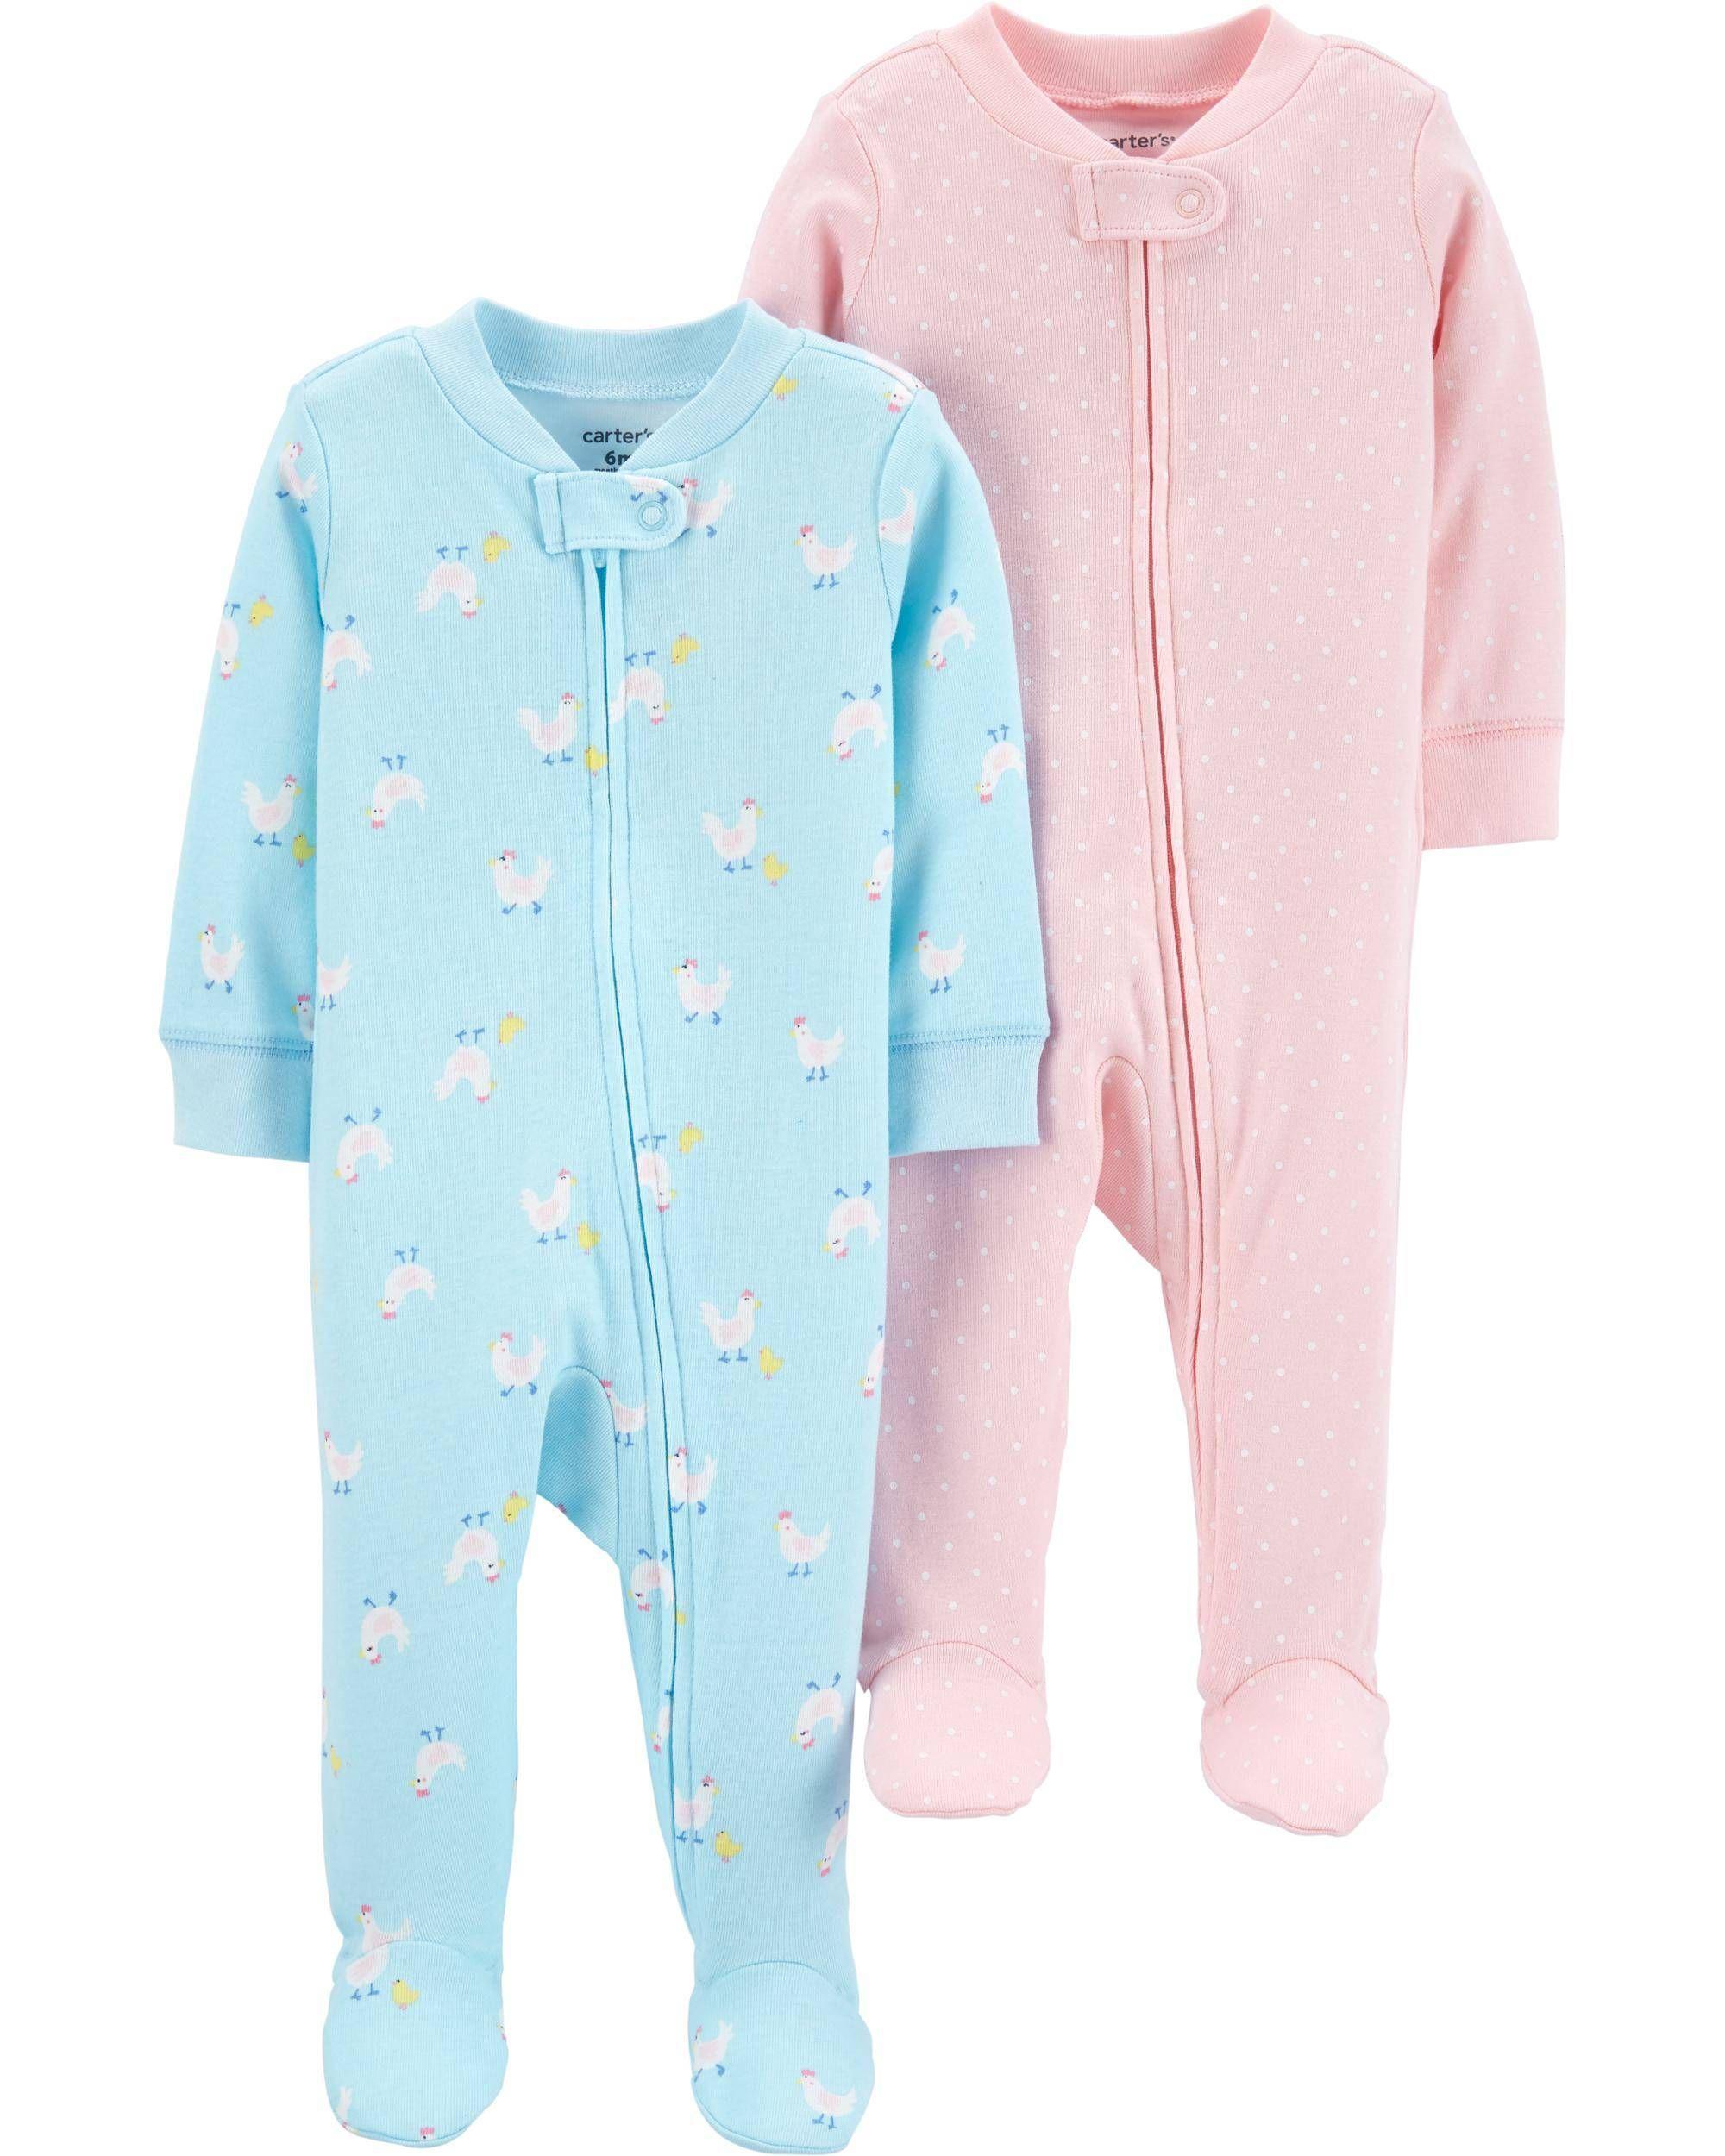 Carters Boys 2-Pack Zip-Up Snug Fit Cotton Romper PJs